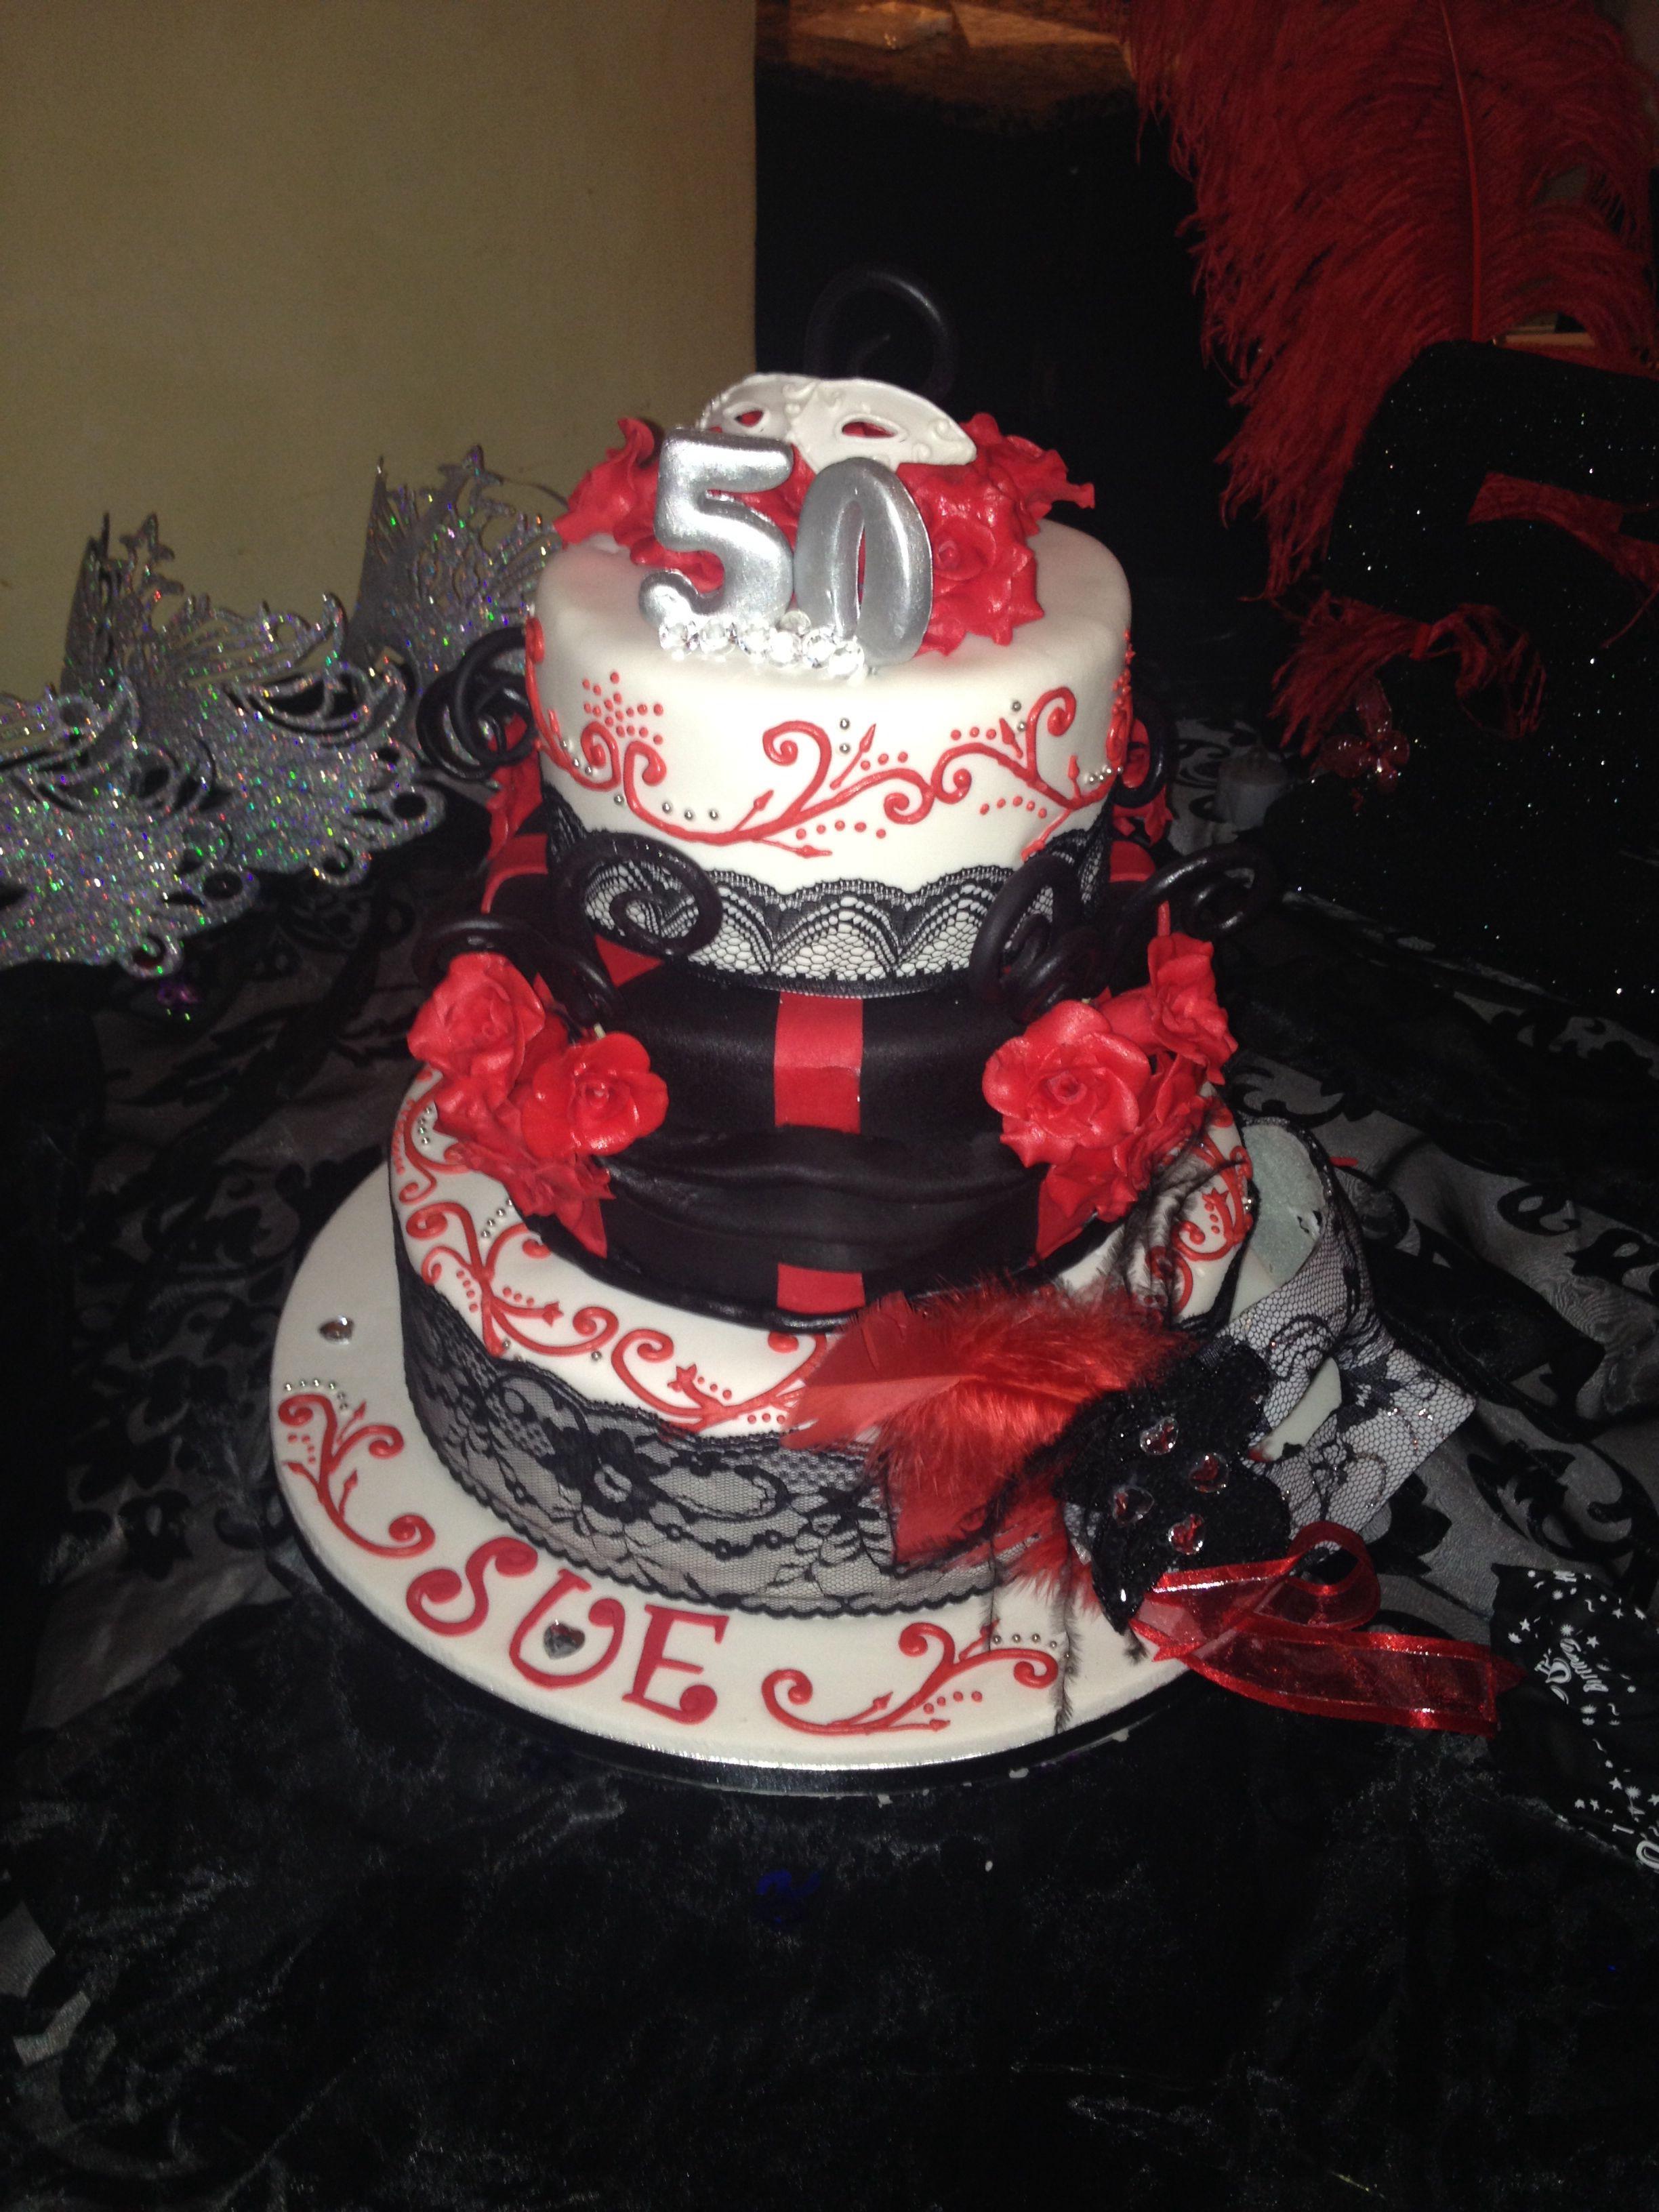 Strange 50Th Birthday Cake With Mask Theme Made By Fantasia Petite Bakery Funny Birthday Cards Online Fluifree Goldxyz